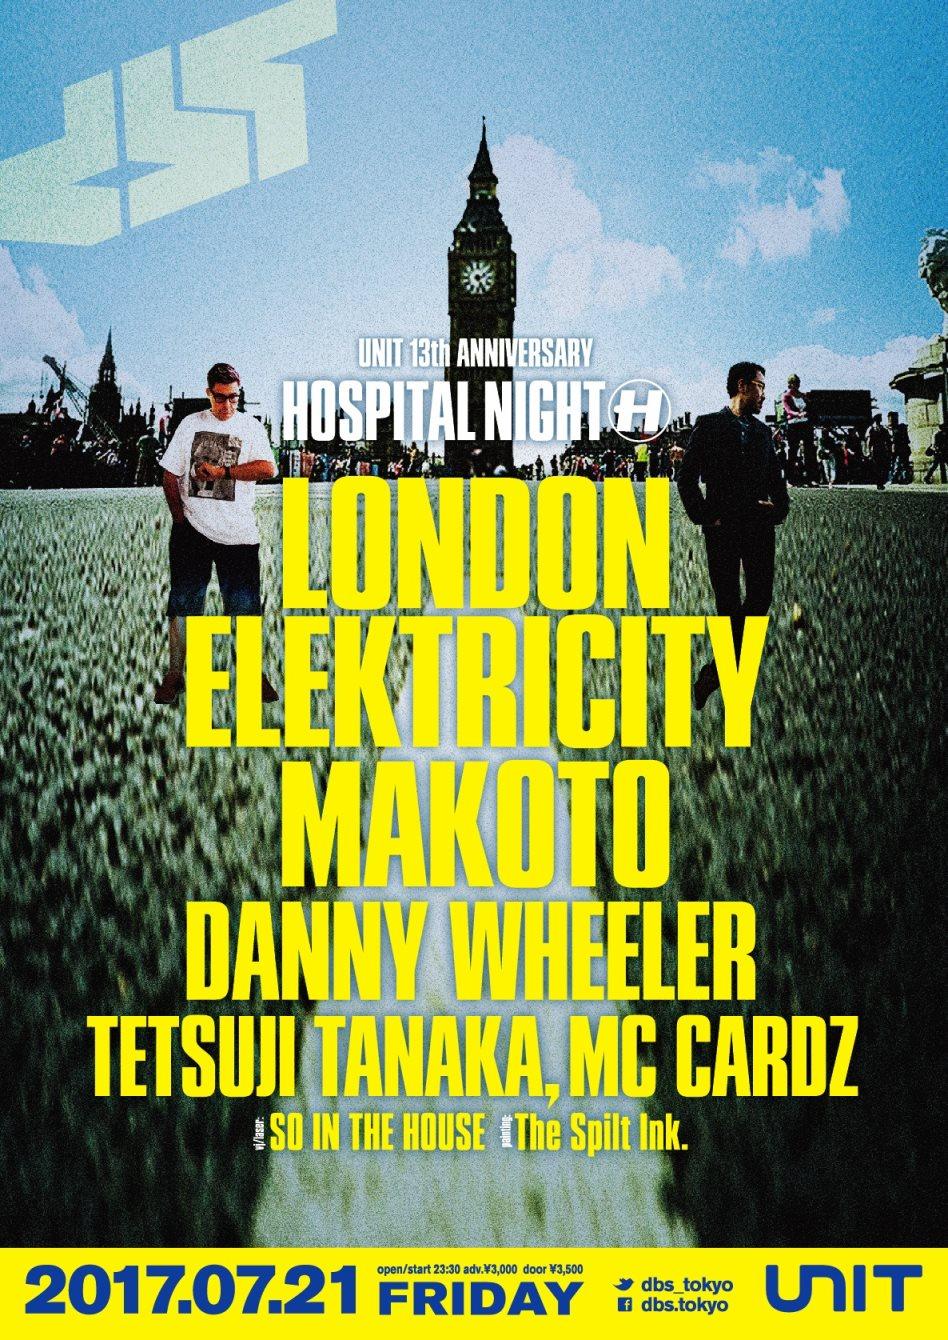 Unit 13th Anniv. DBS: 'Hospital Night' London Elektricity & Makoto - Flyer front